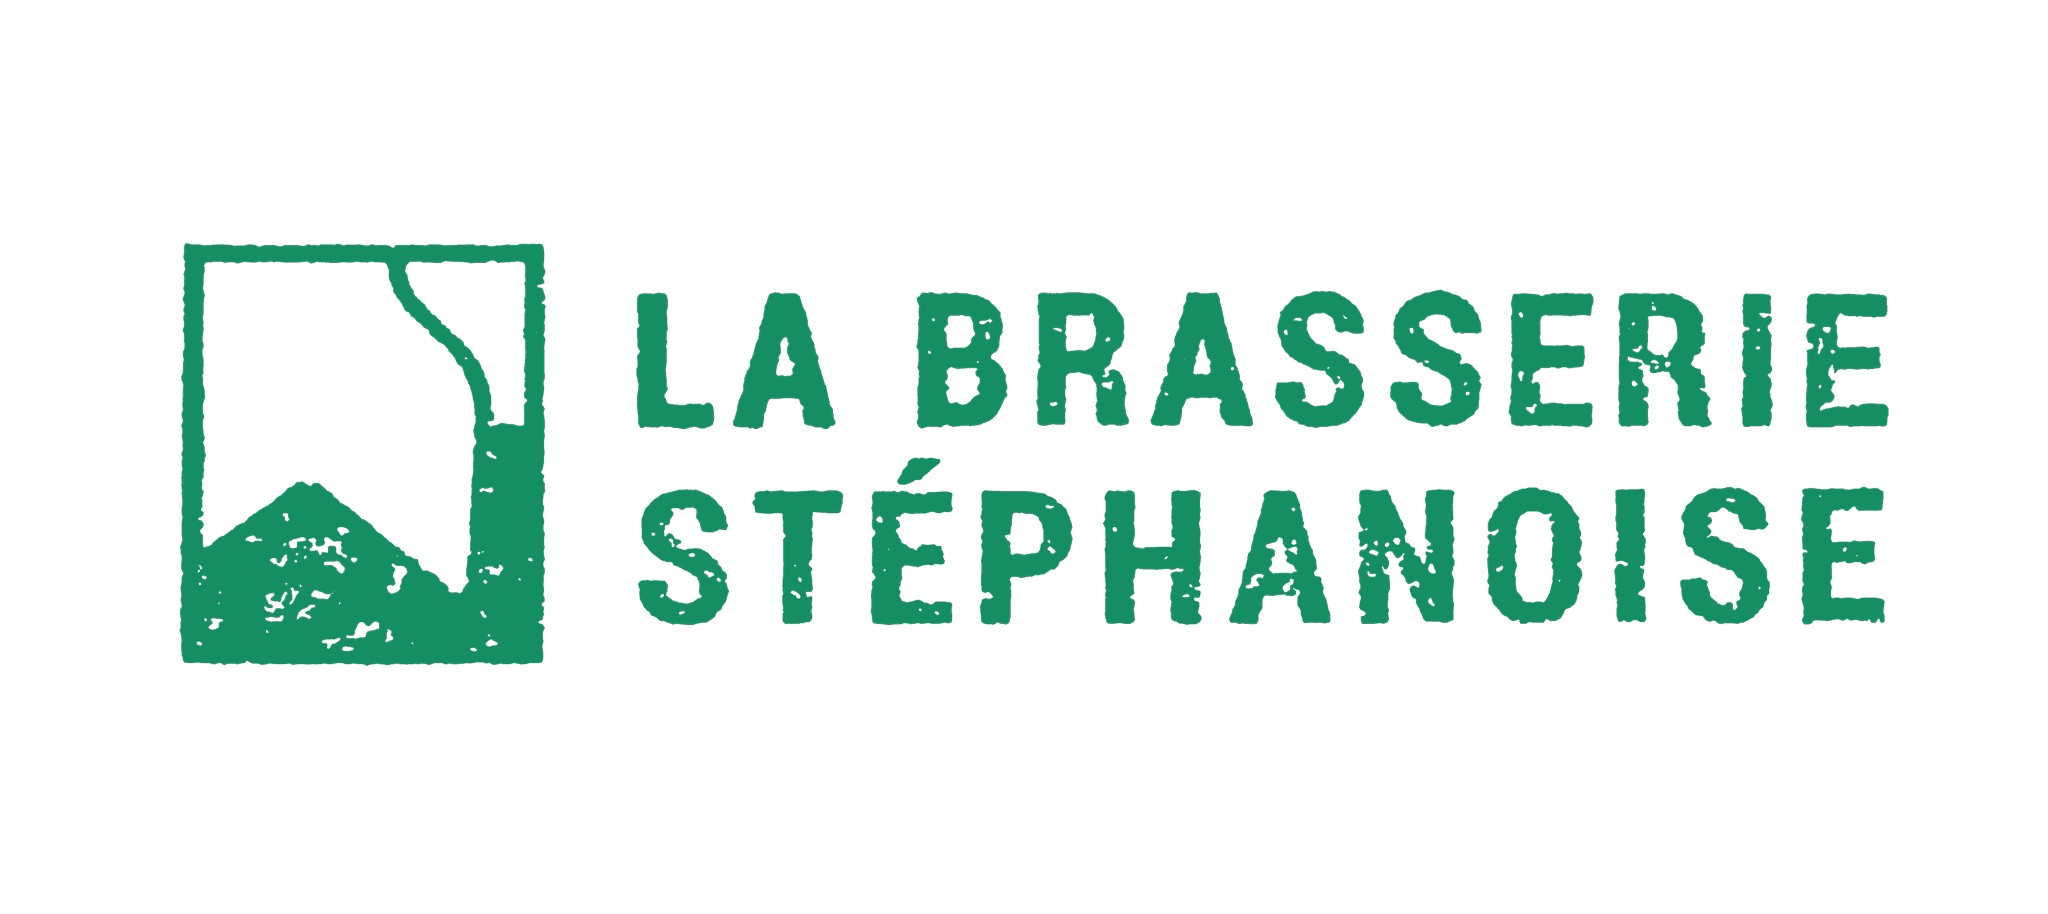 La brasserie Stéphanoise